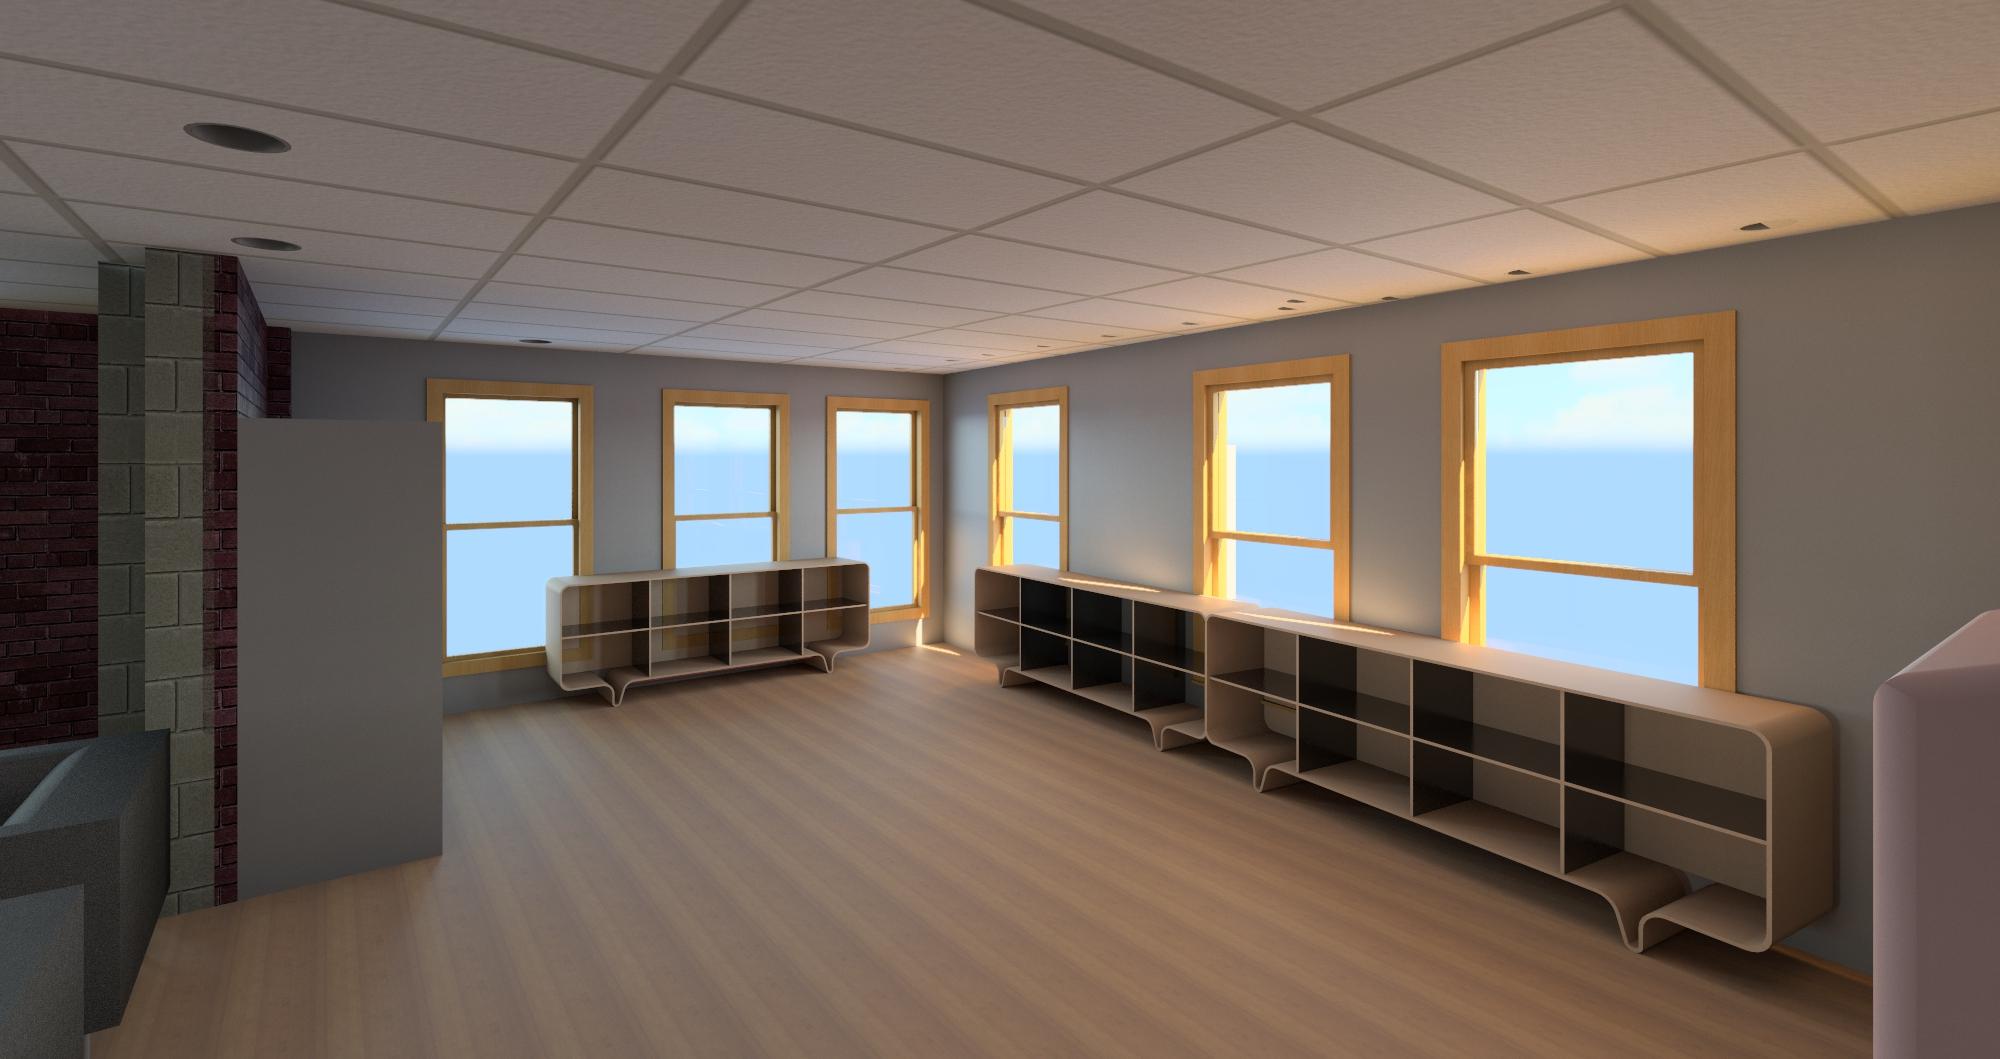 Project1_Birkum_Hot_Yoga_Hyattsville.rvt_2013-Mar-25_09-22-34PM-000_3D_View_1_Yoga_Studio_Second_Floor_Children's_Play_Room_View_1.jpg